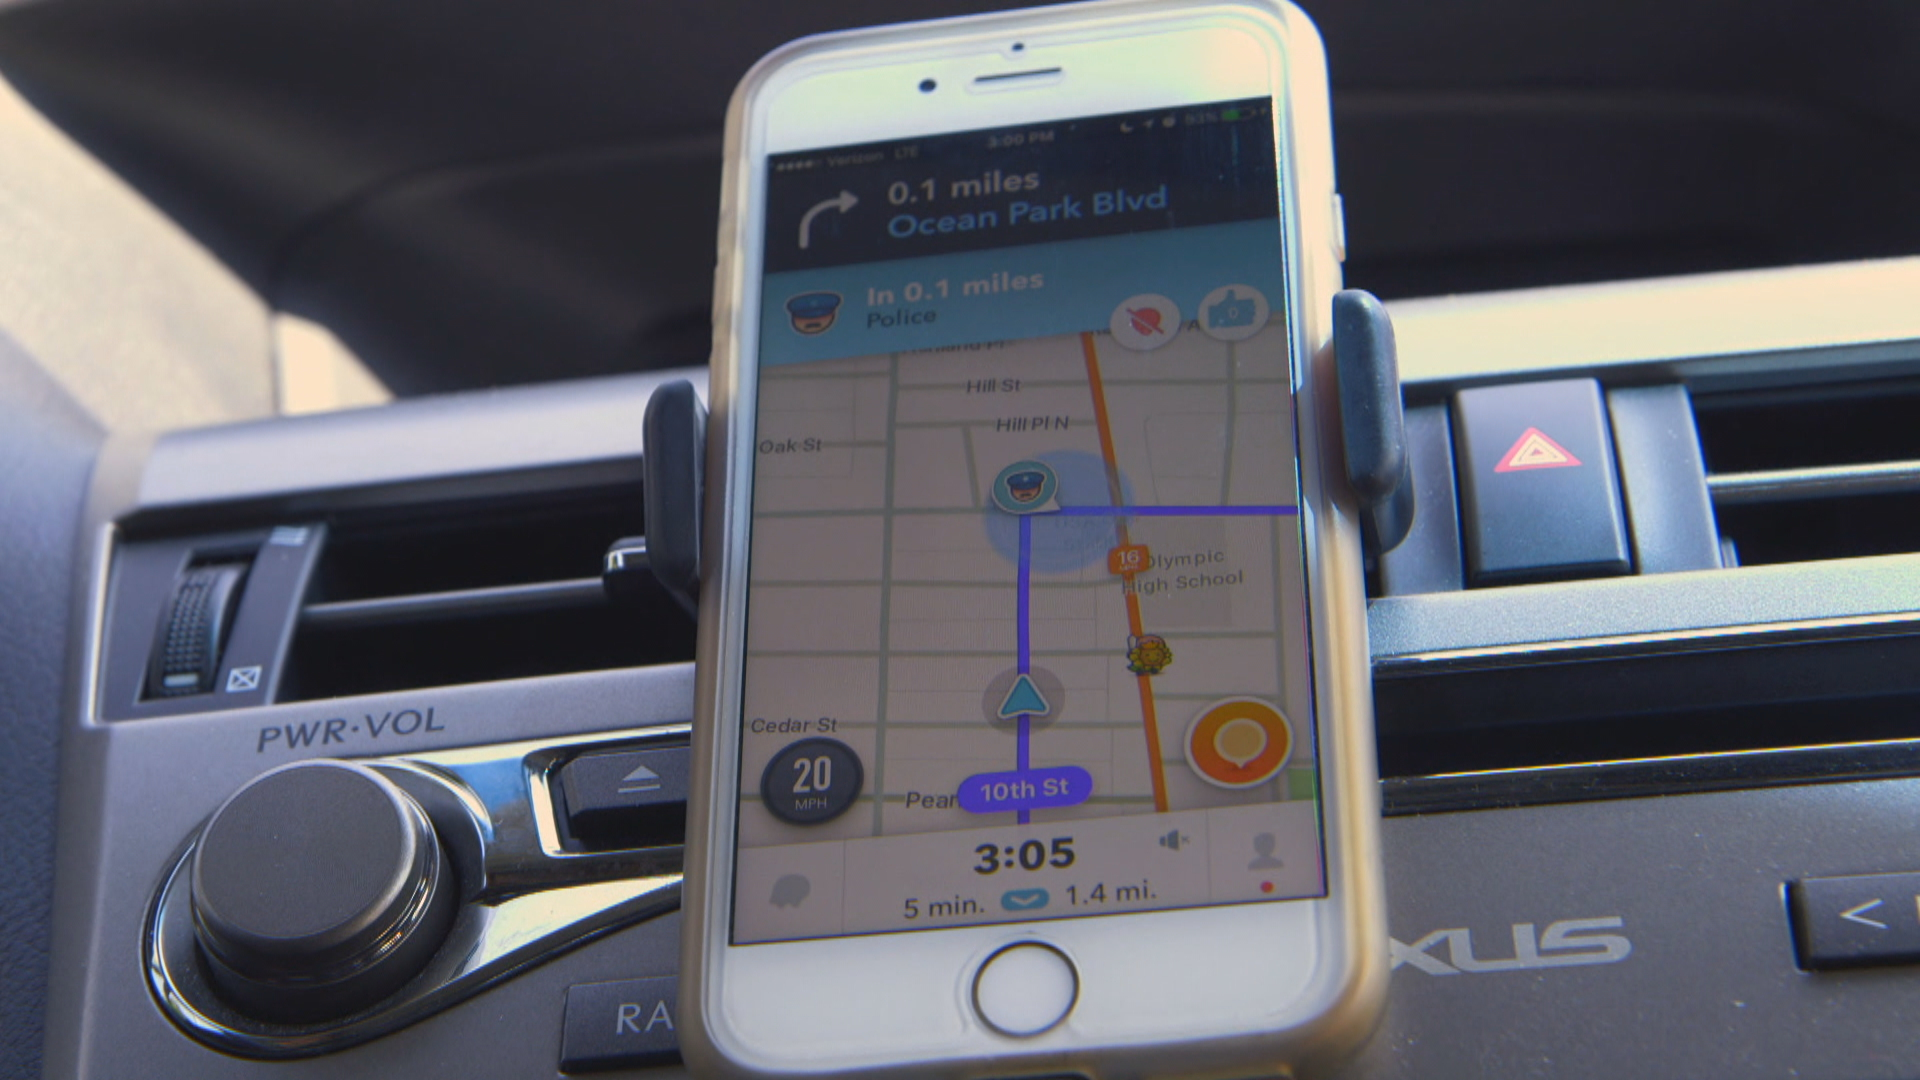 Your commute could now get a bit longer with the Waze app - CBS News